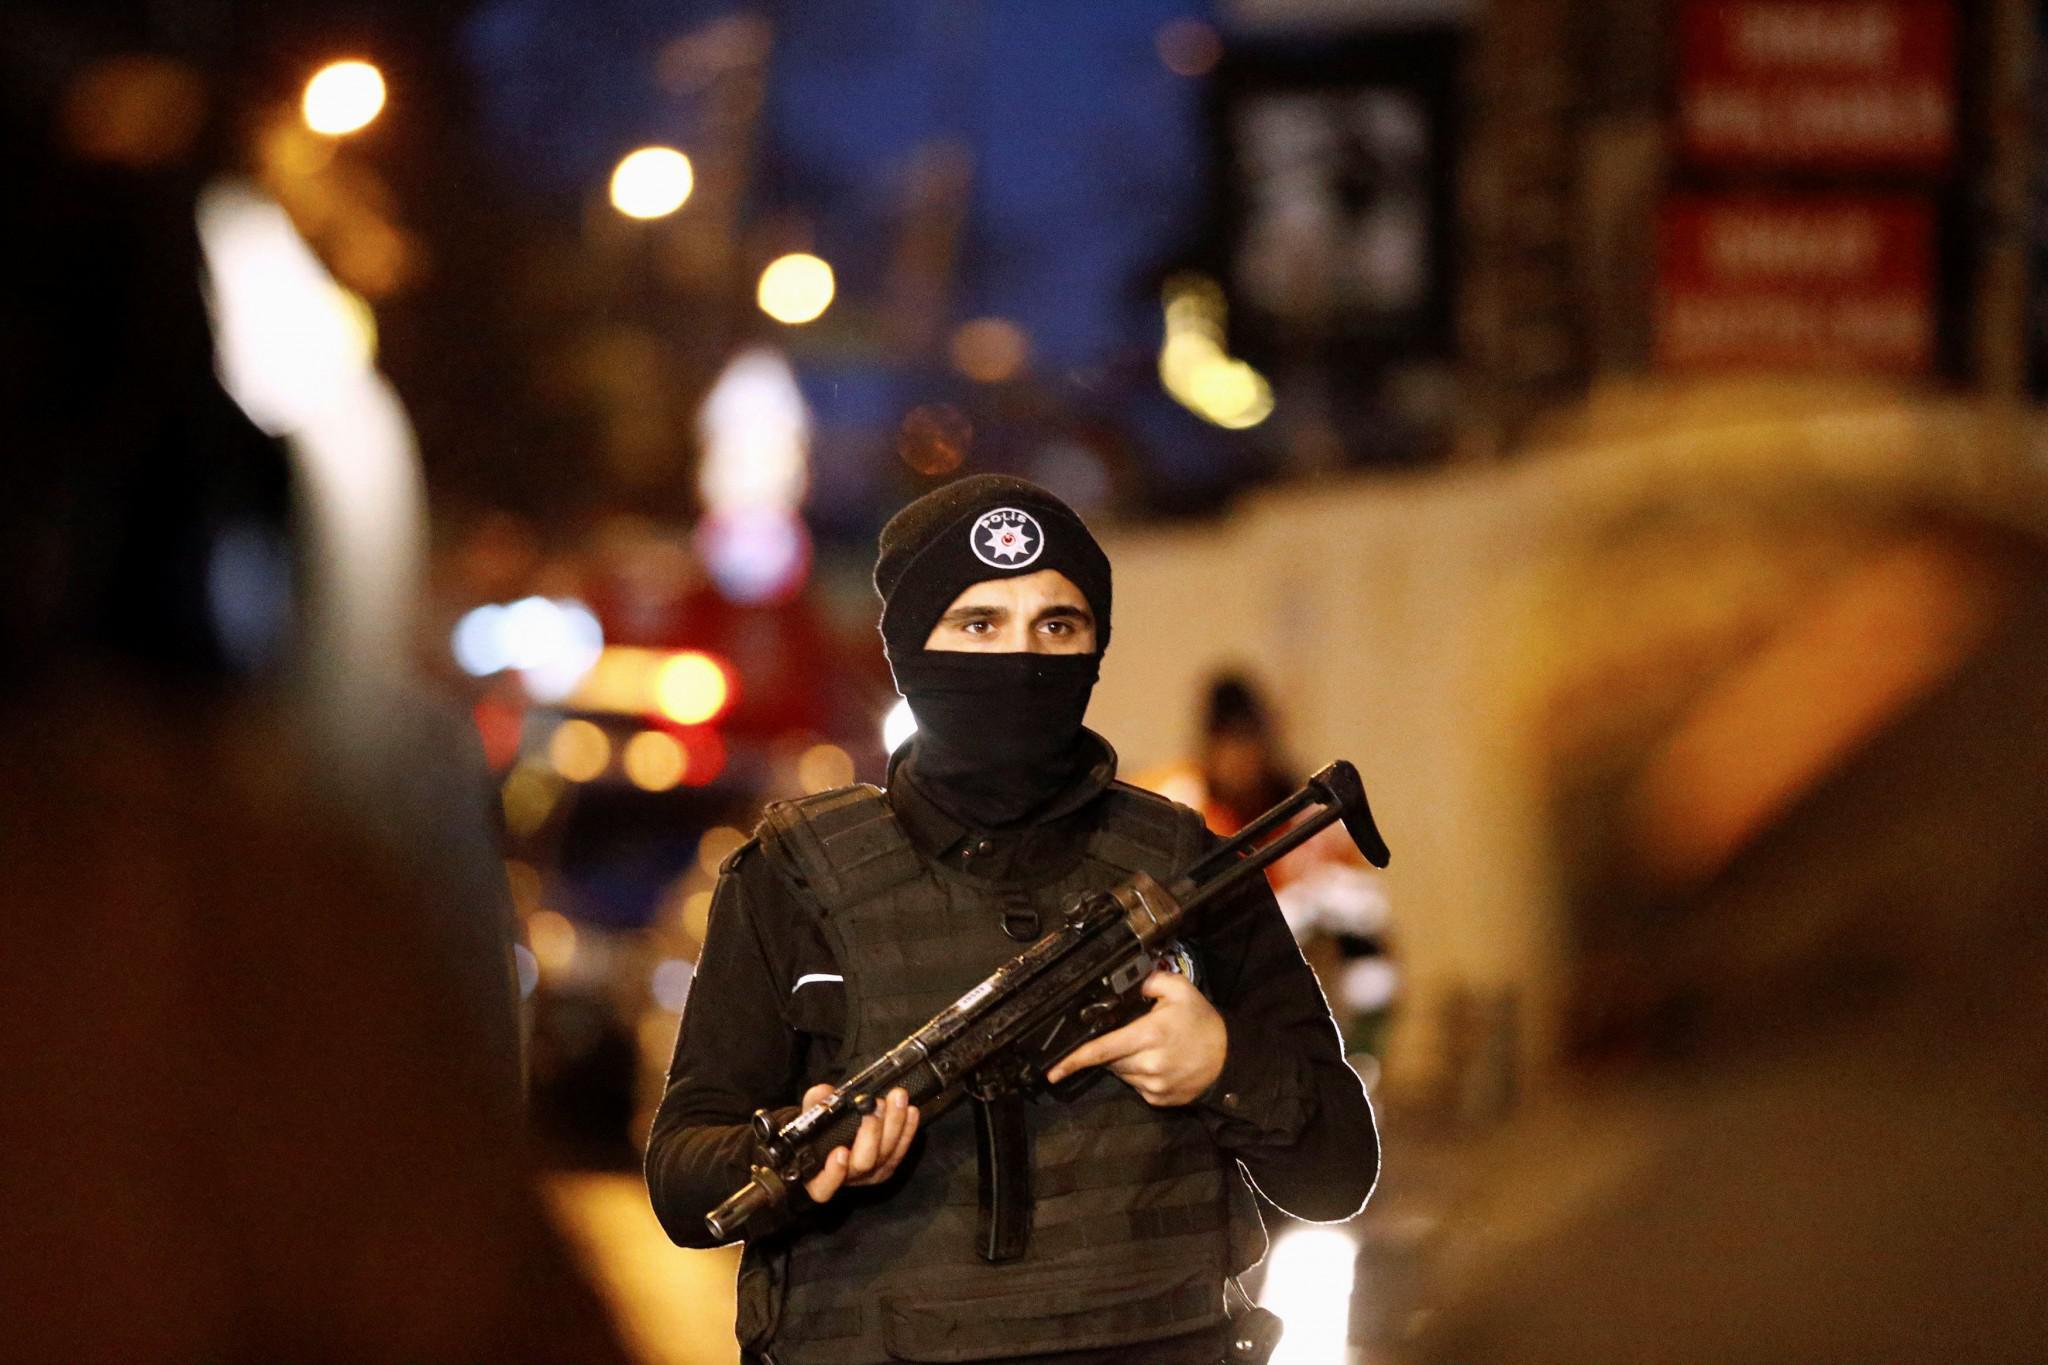 tourkia-epithesi-klamp-nekroi-6 Έτσι σκόρπισε τον θάνατο ο μακελάρης της Κωνσταντινούπολης [εικόνες & βίντεο]